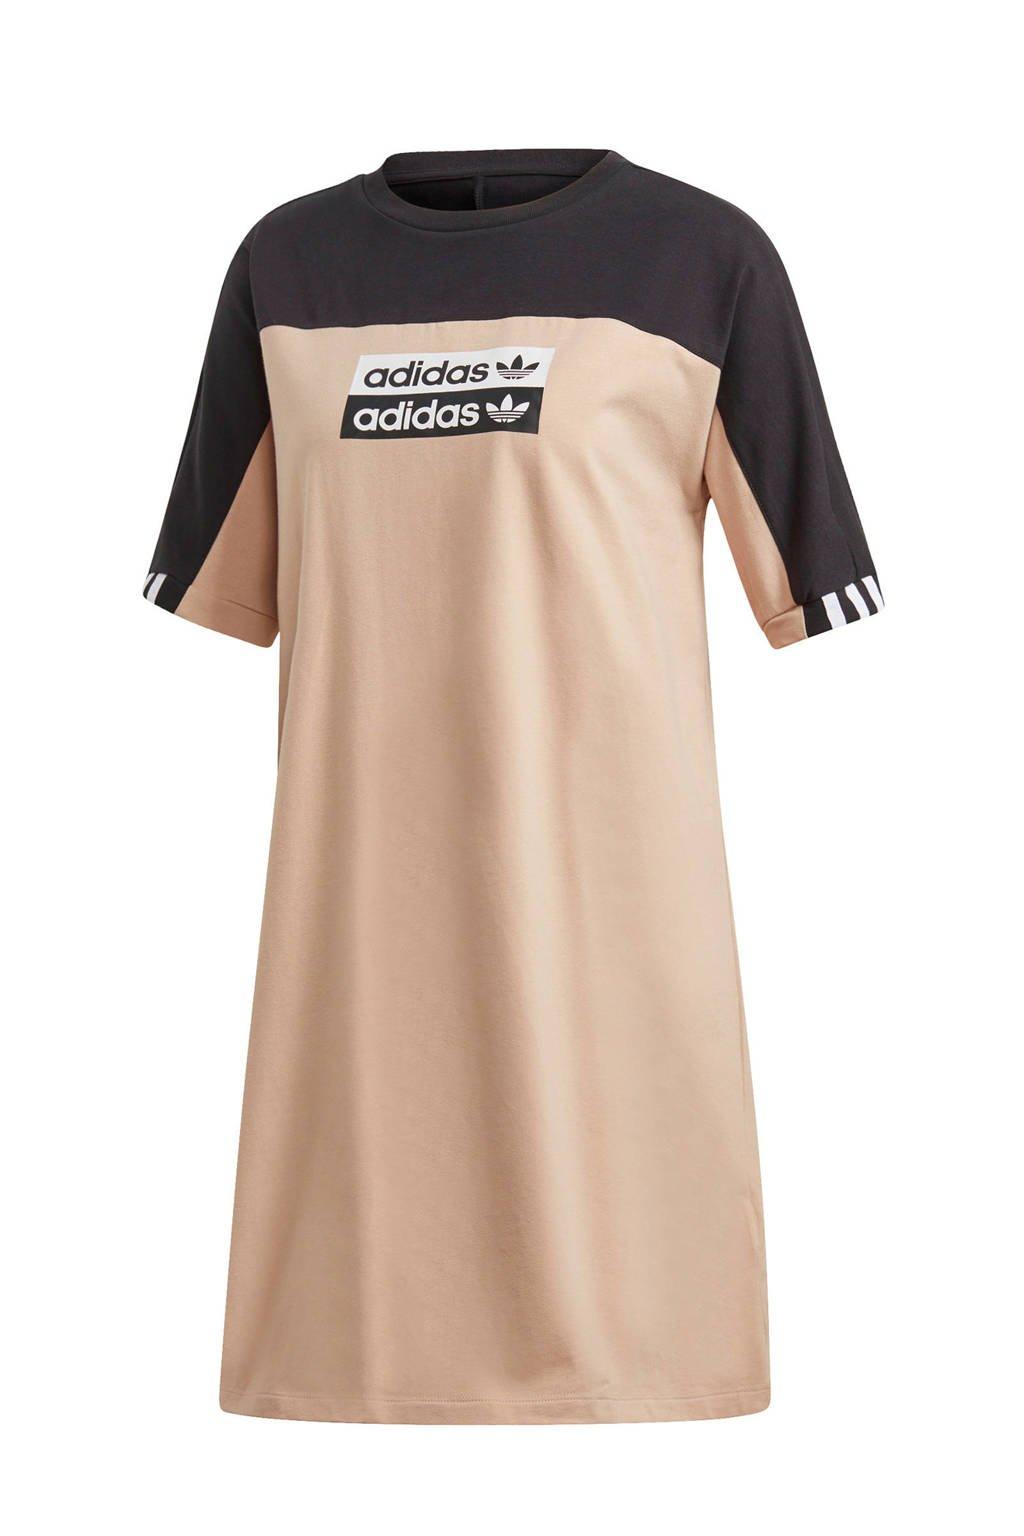 adidas originals jurk, Grijs/zwart